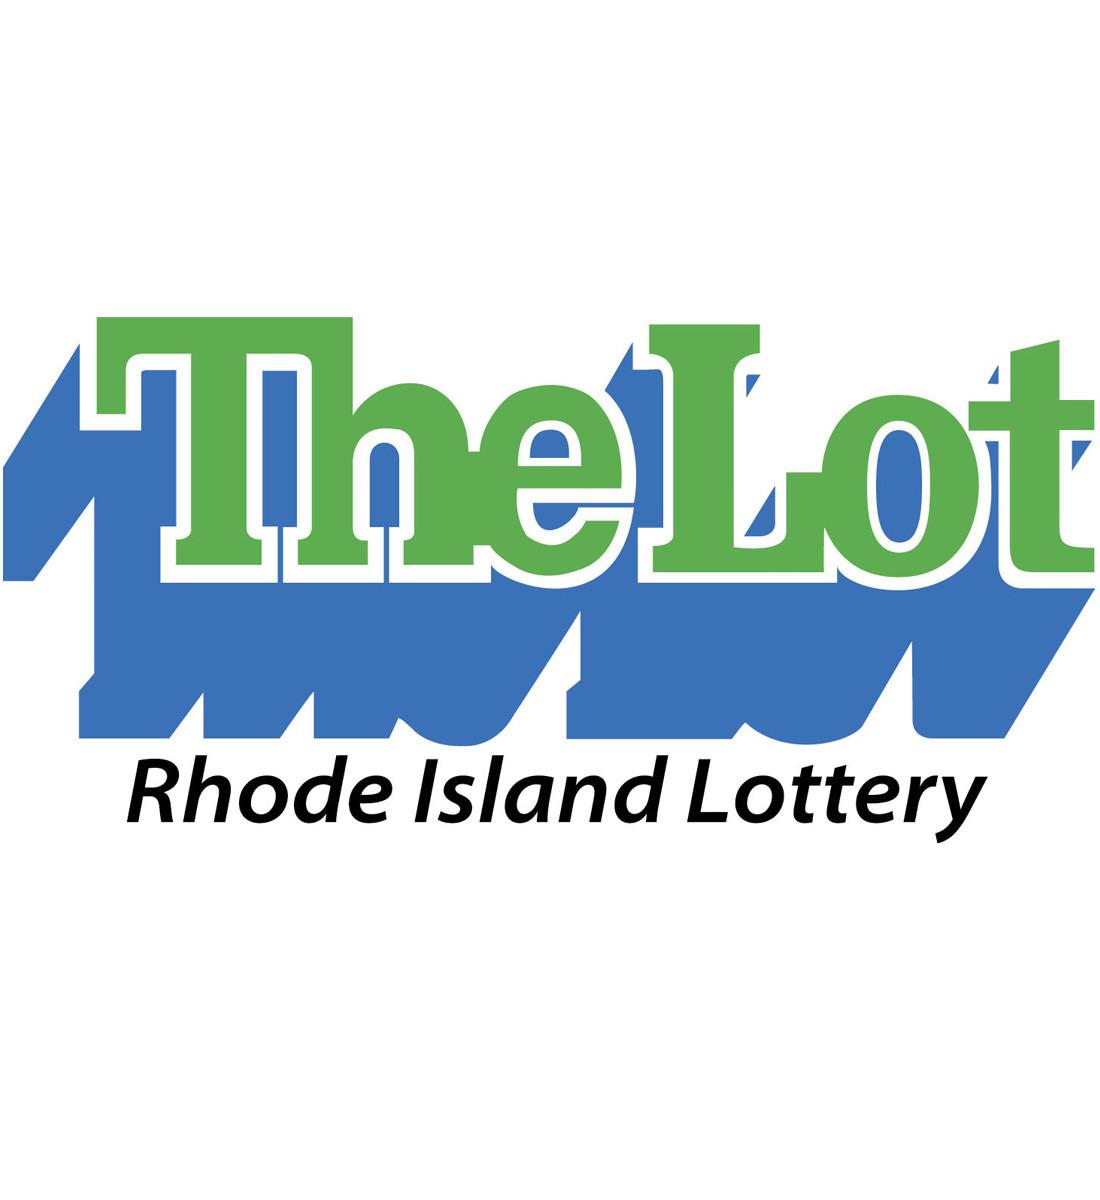 Island Lottery